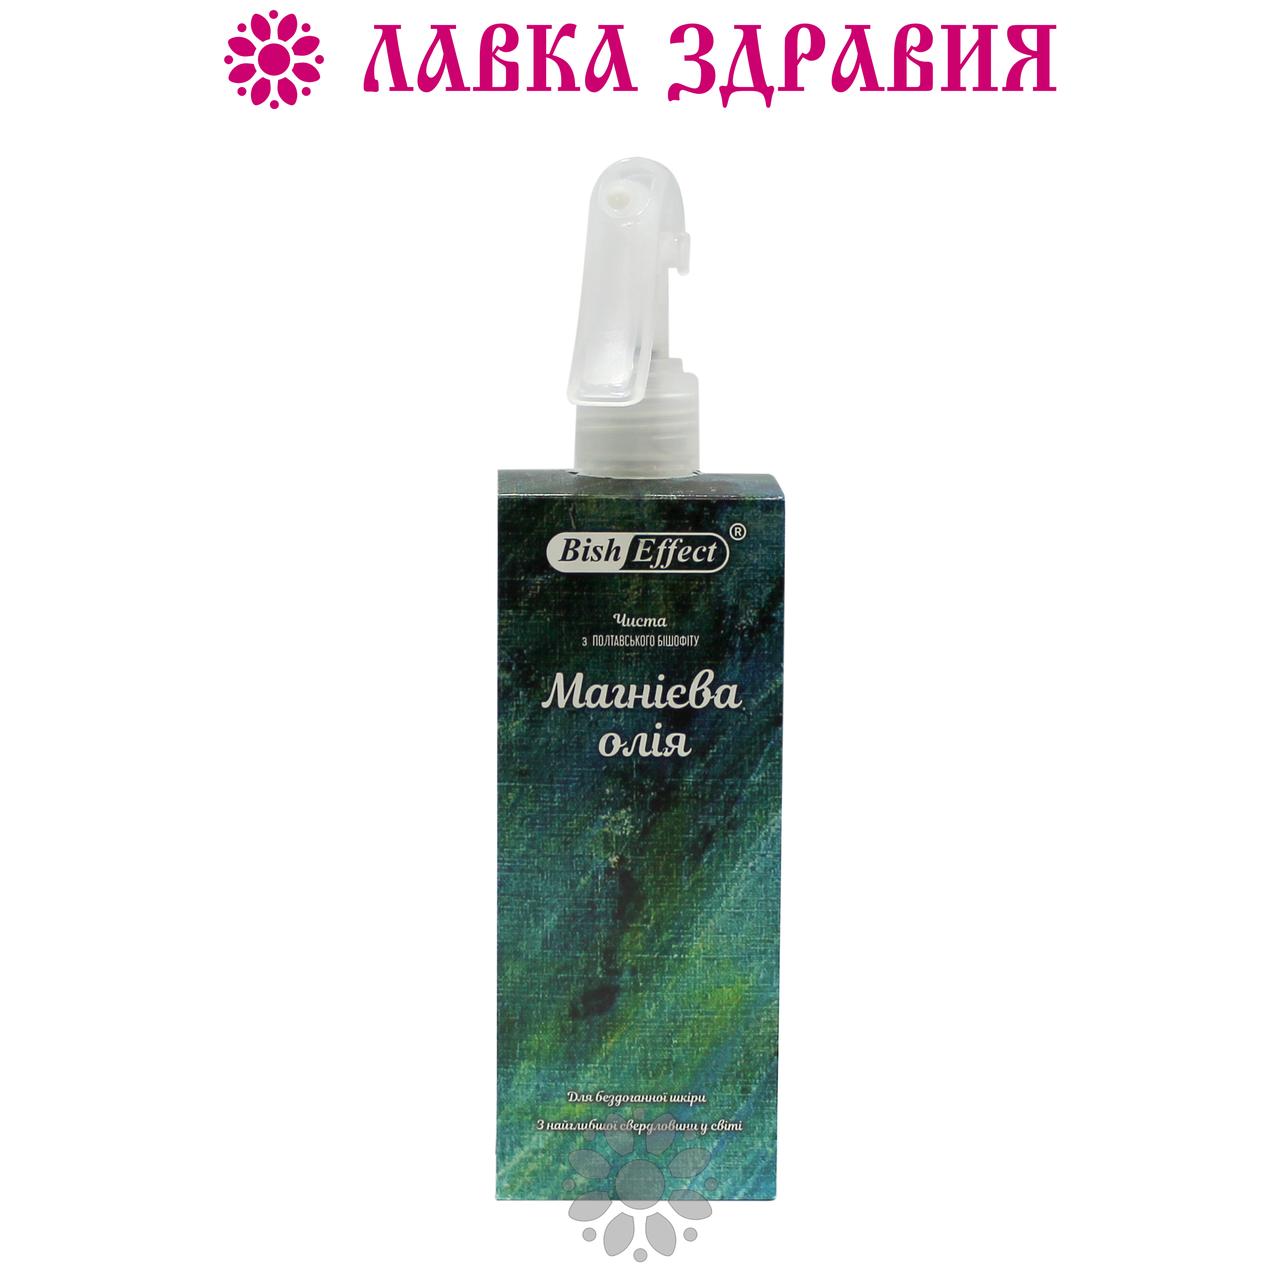 Магниевое масло, 250 мл, Bish Effect